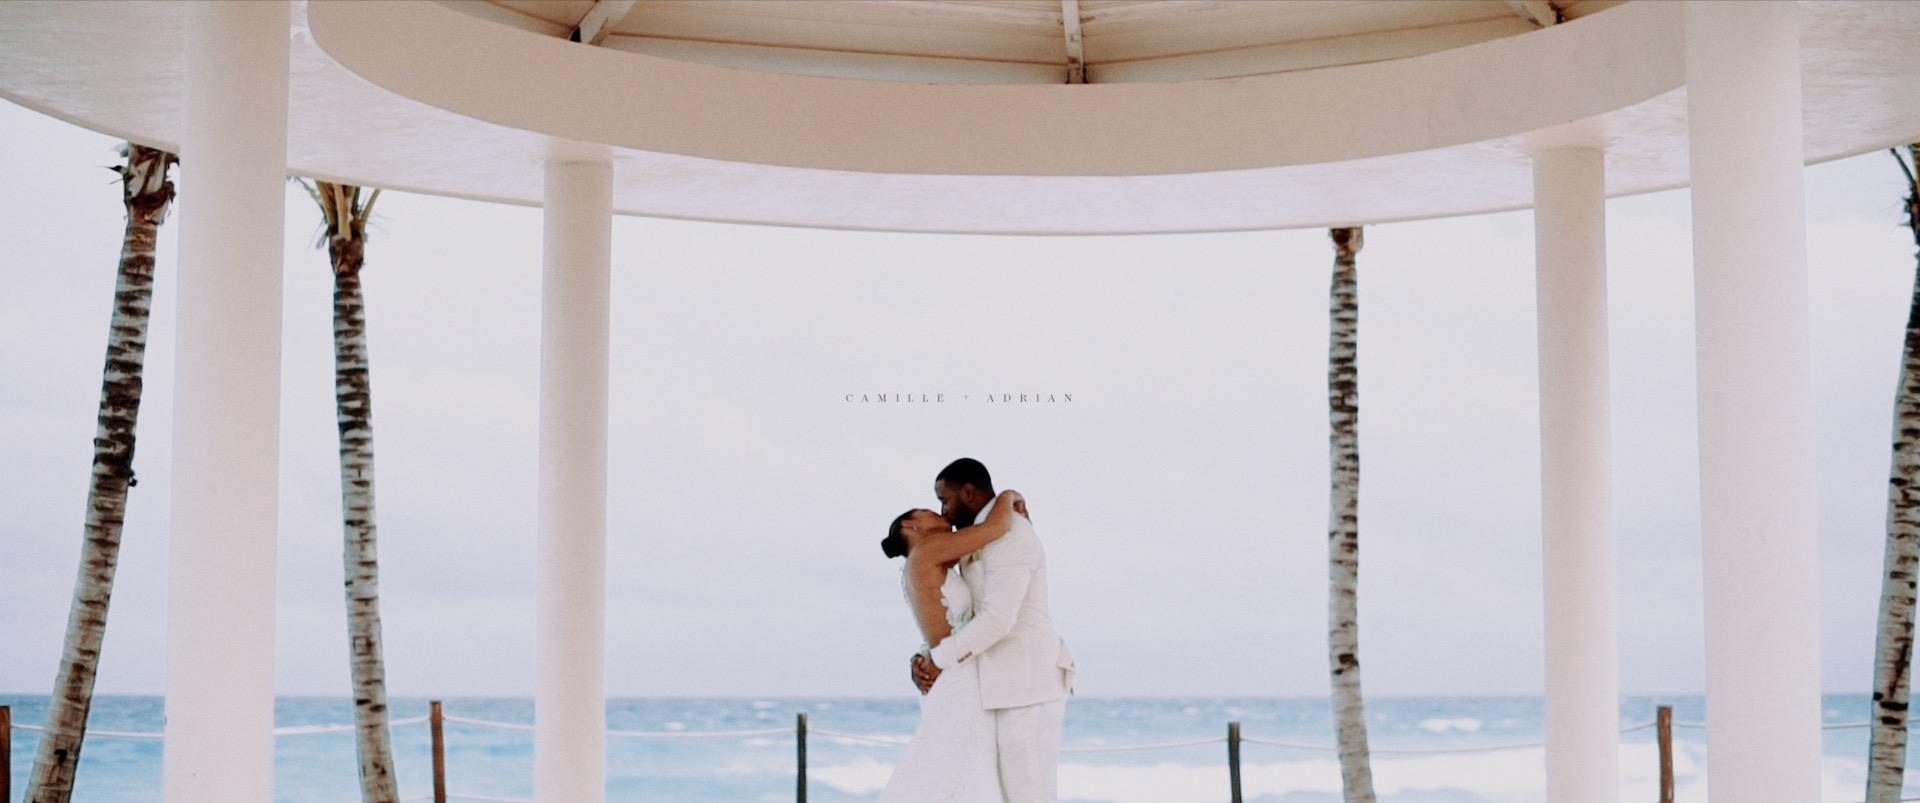 Camille + Adrian | Cancun, Mexico